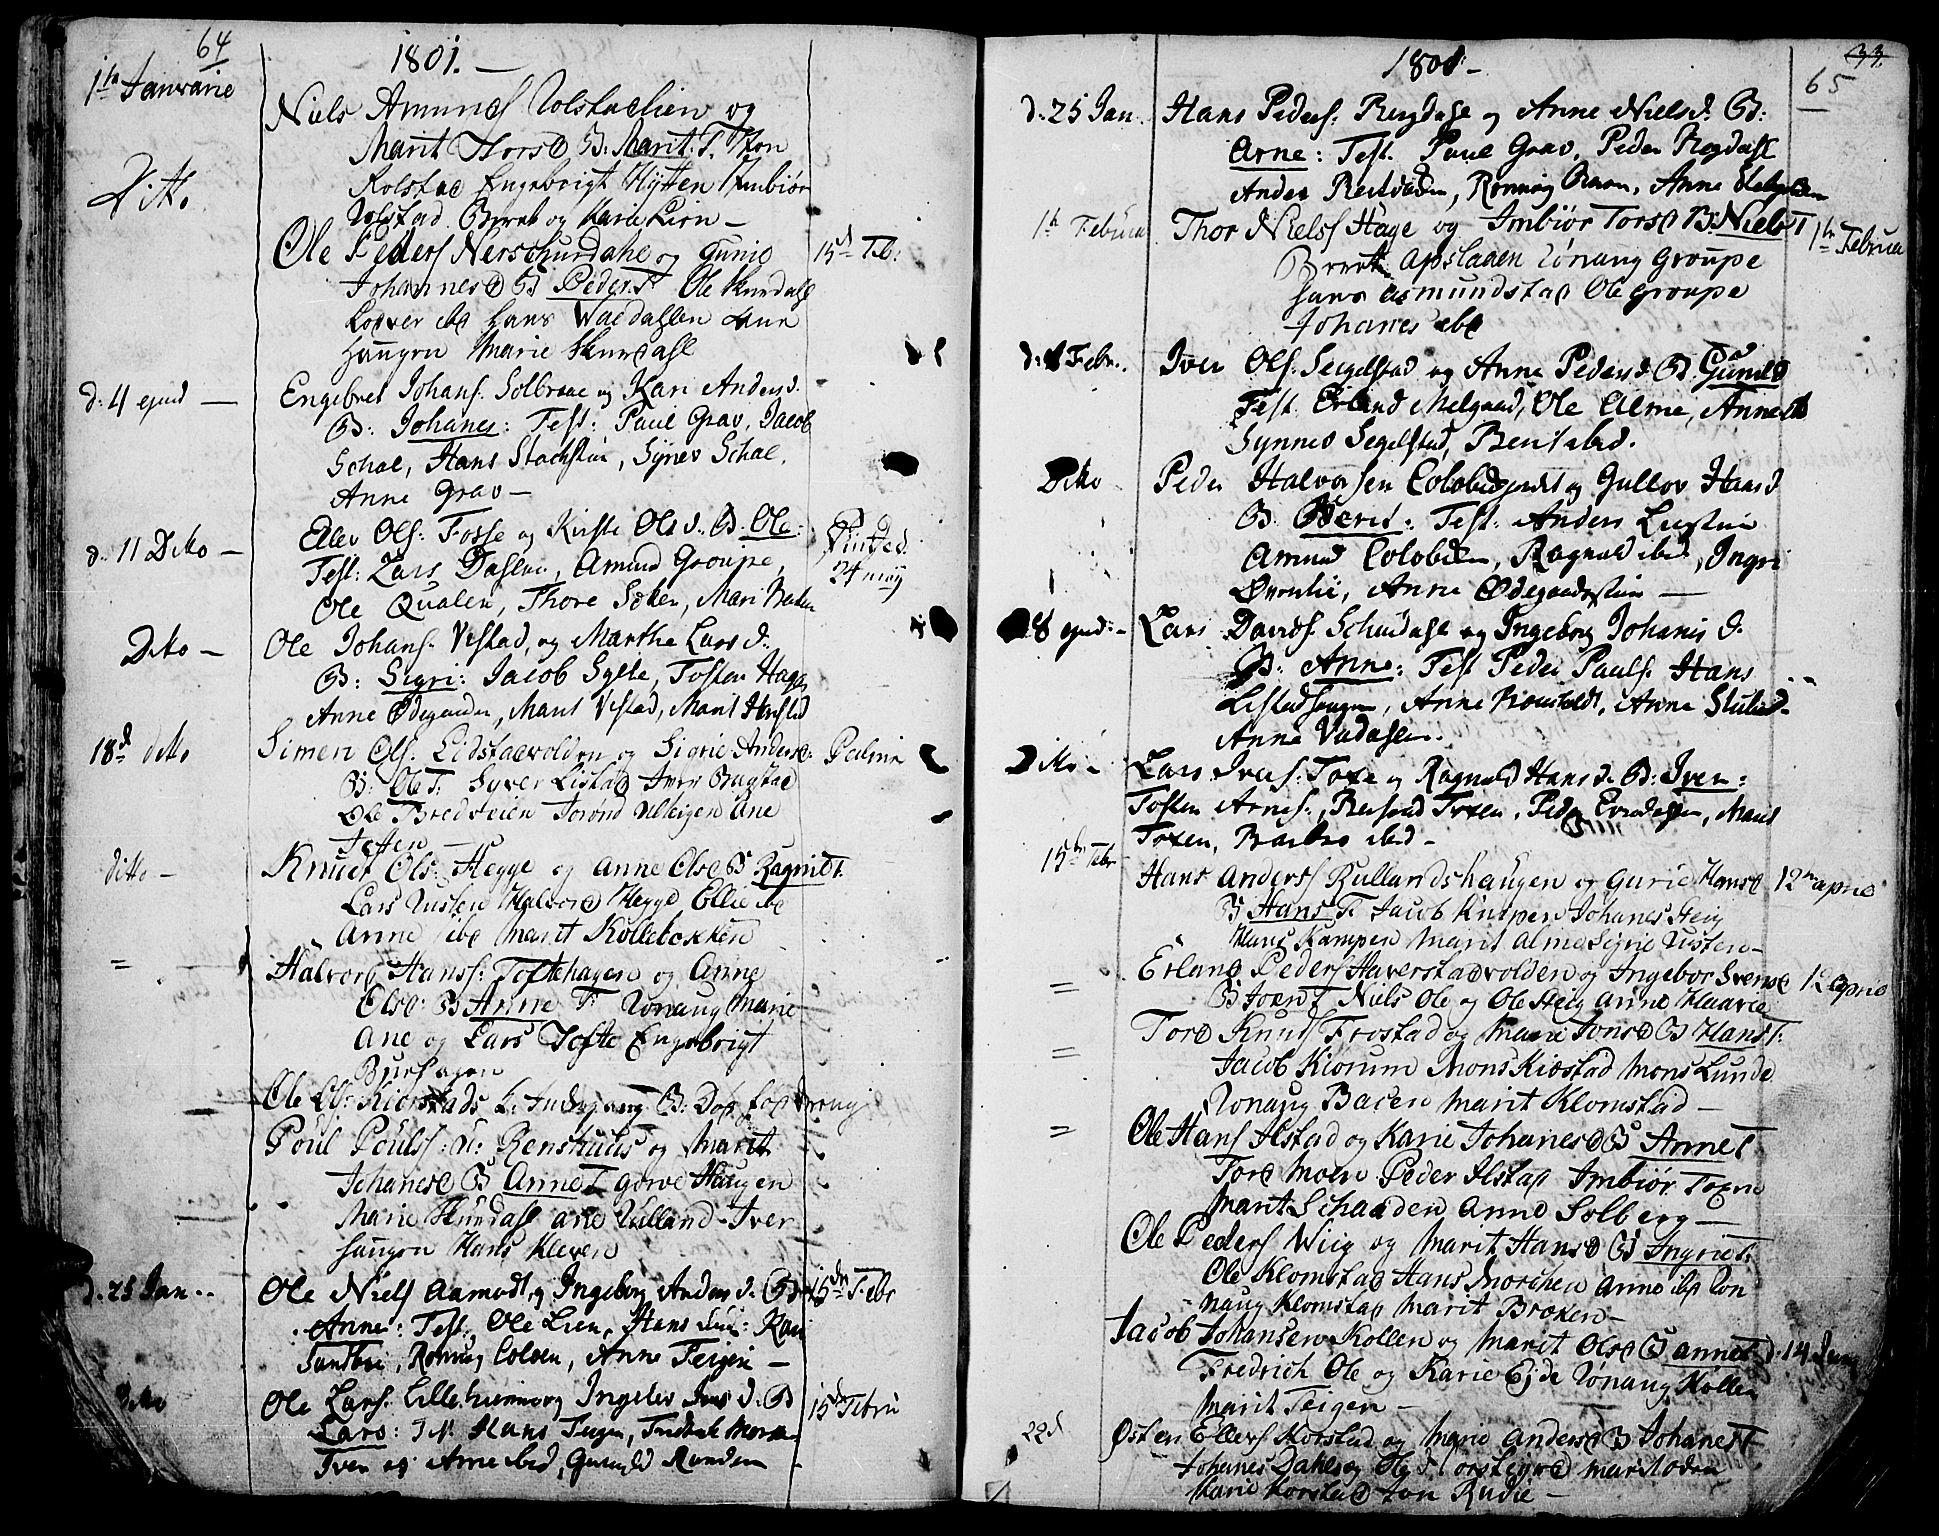 SAH, Fron prestekontor, H/Ha/Haa/L0001: Ministerialbok nr. 1, 1799-1816, s. 64-65